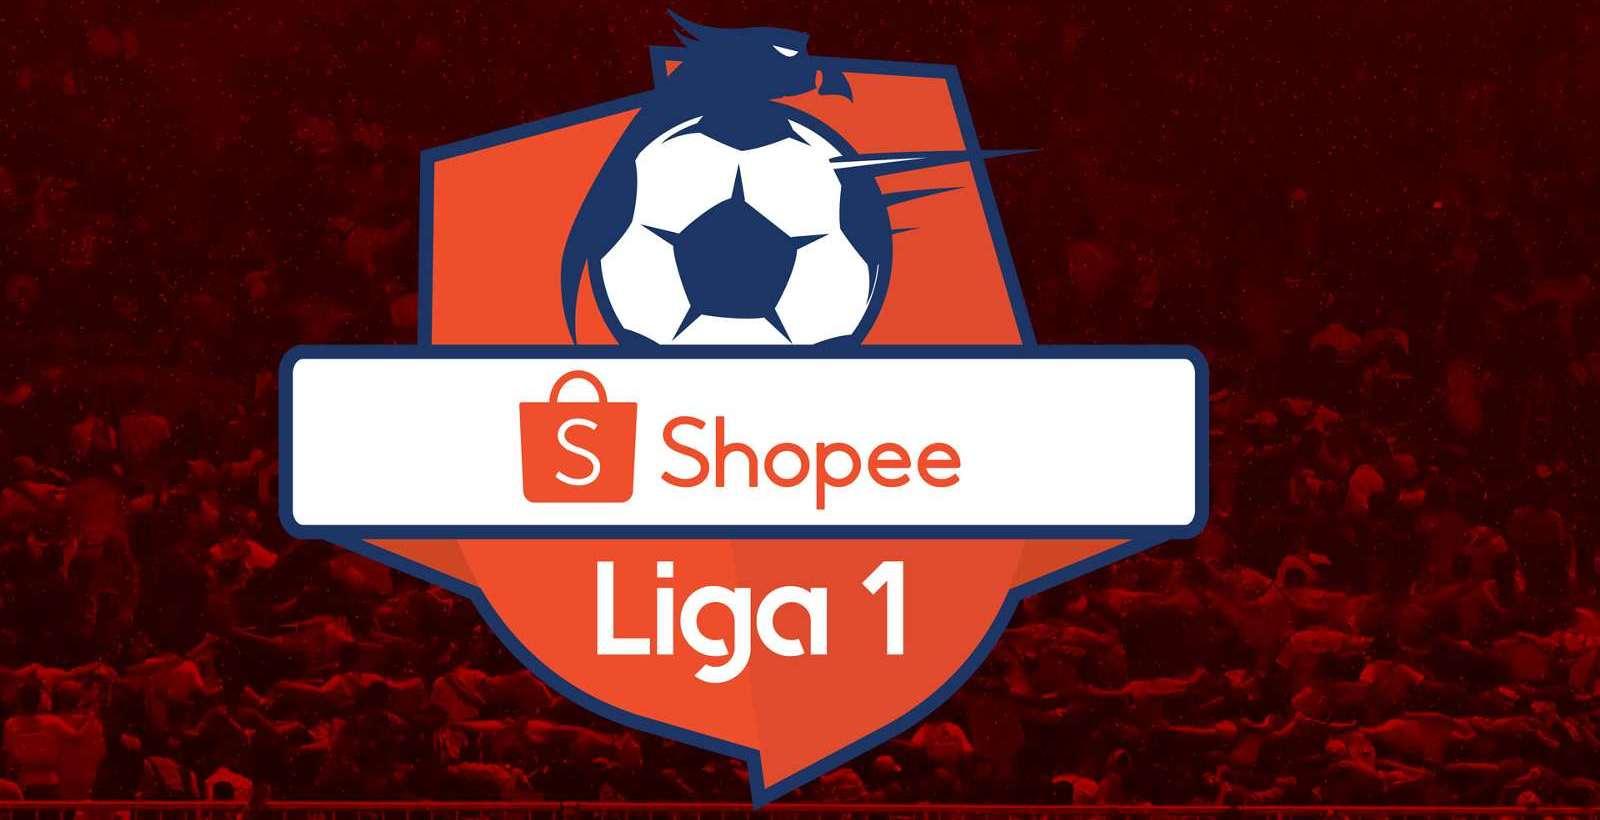 Link LIVE Streaming Indosiar Shopee Liga 1 2019